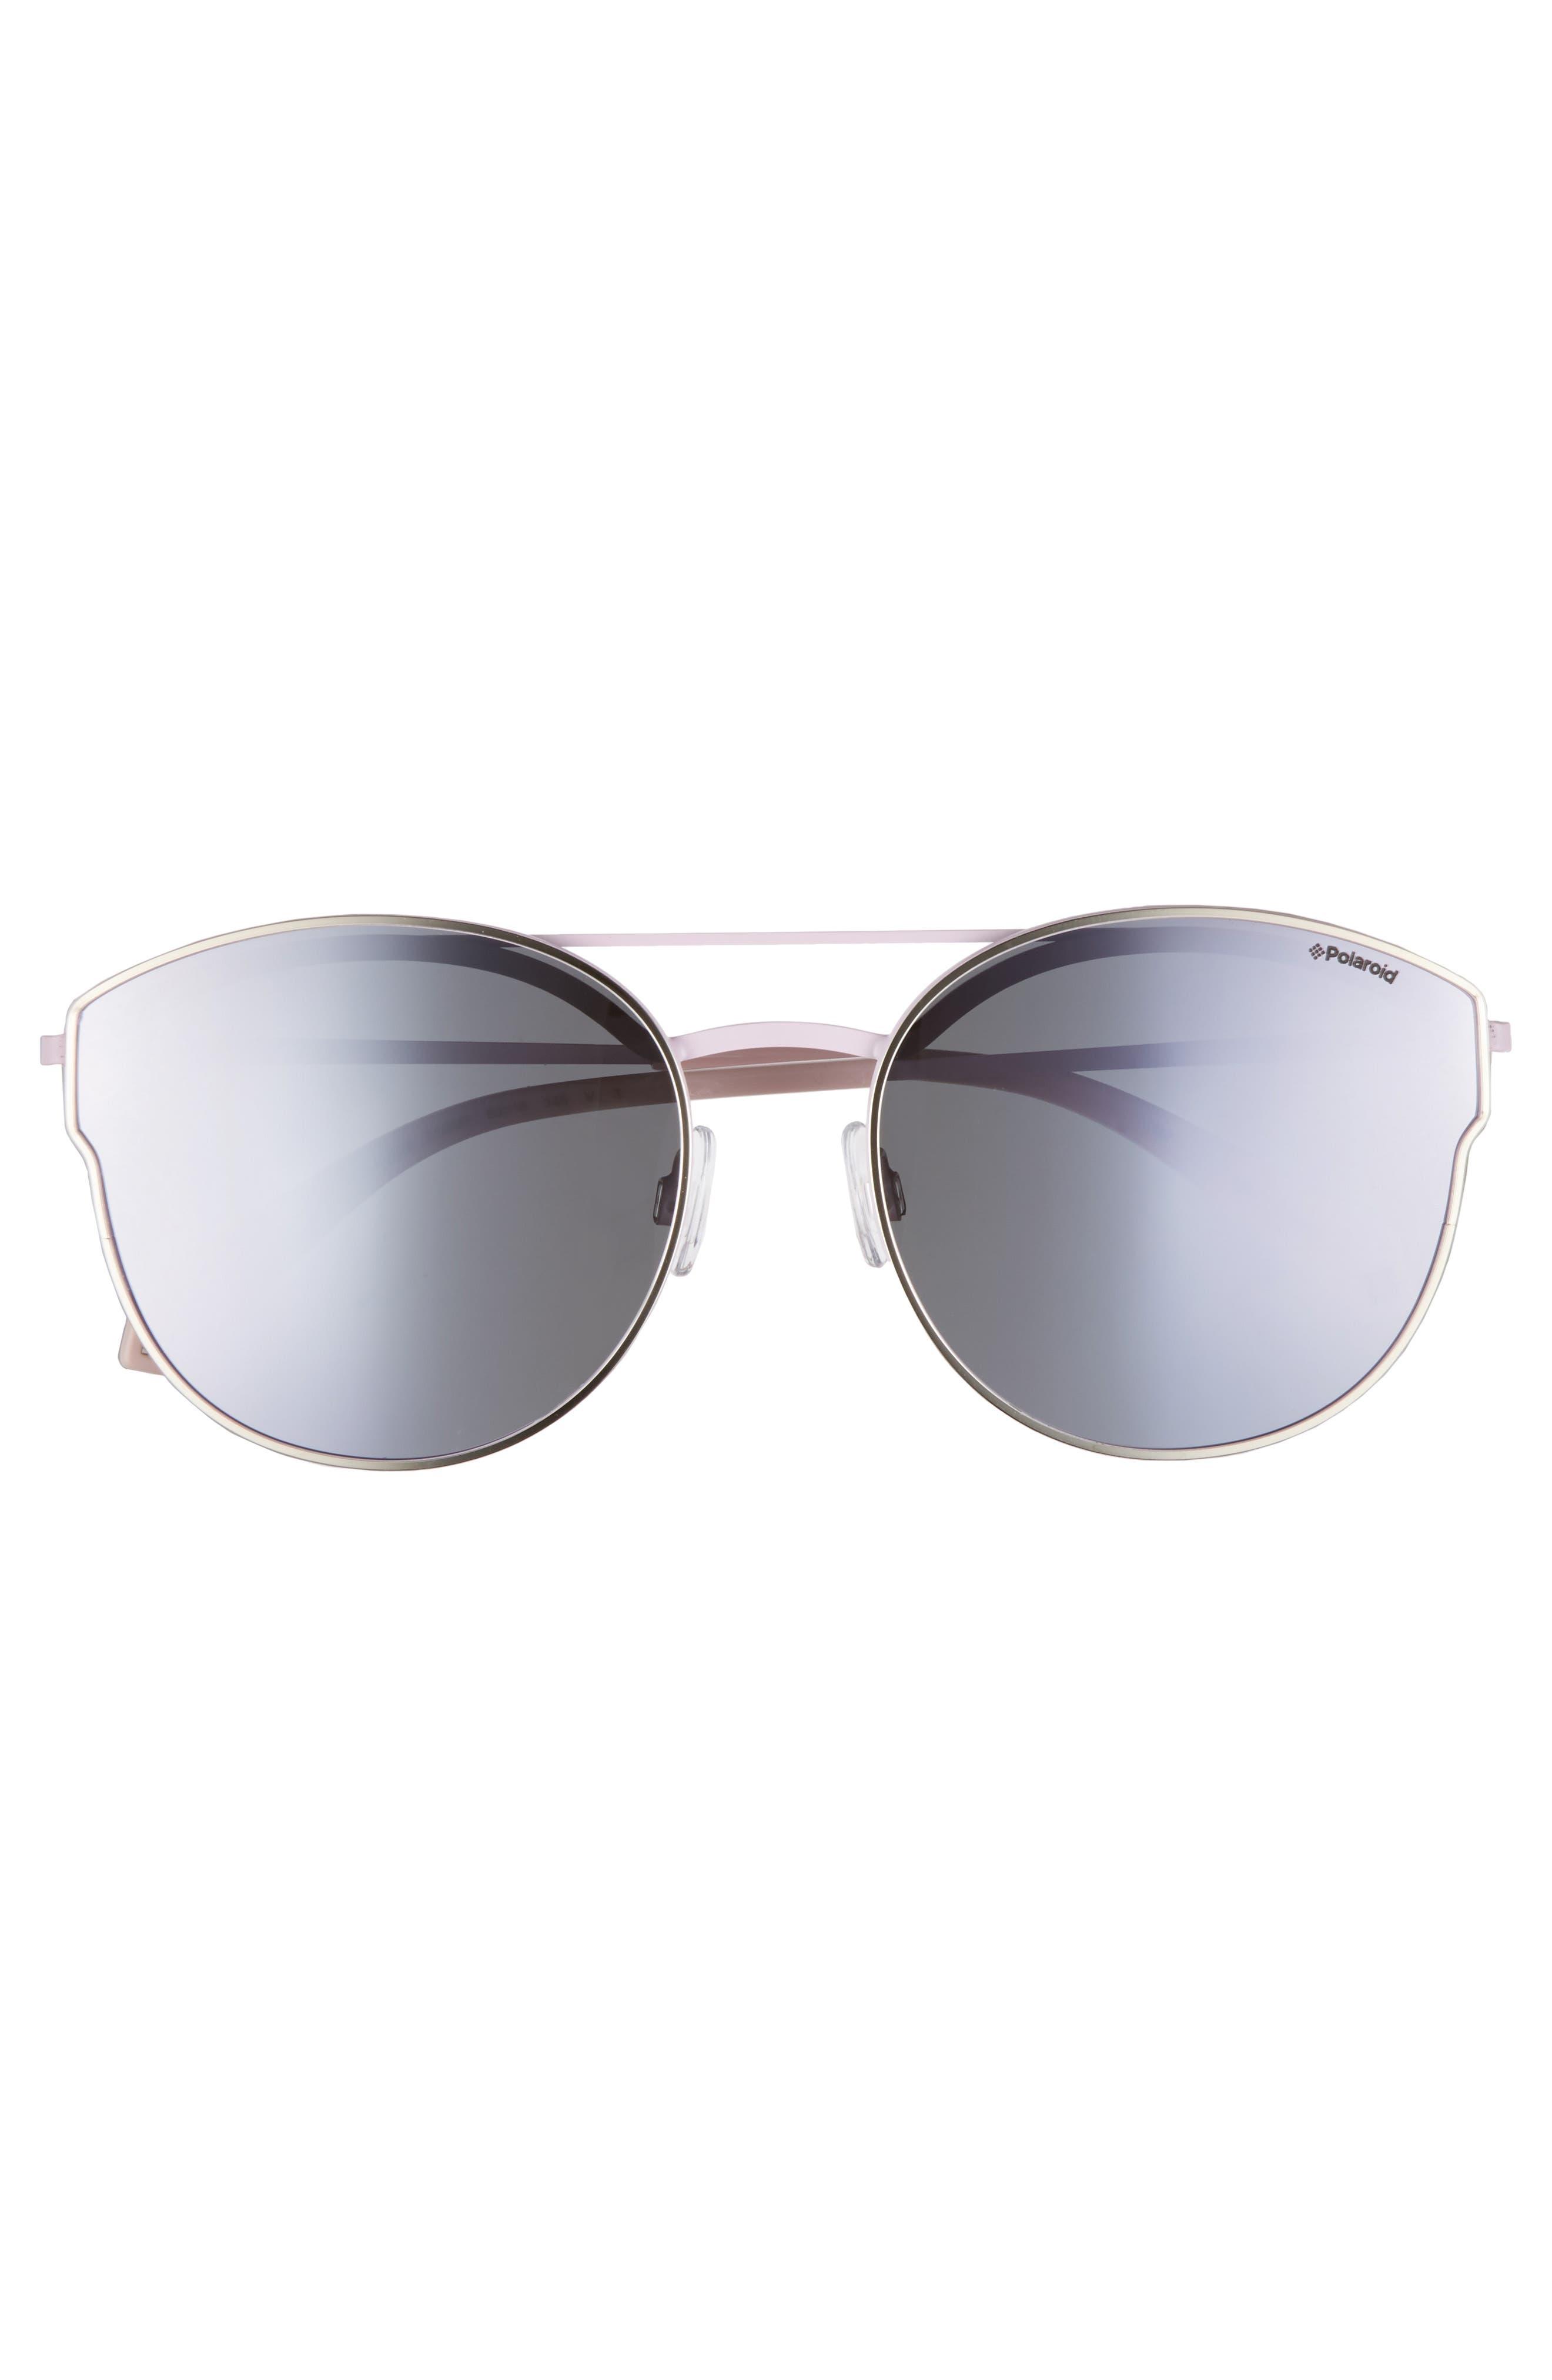 60mm Polarized Round Aviator Sunglasses,                             Alternate thumbnail 2, color,                             Light Gold